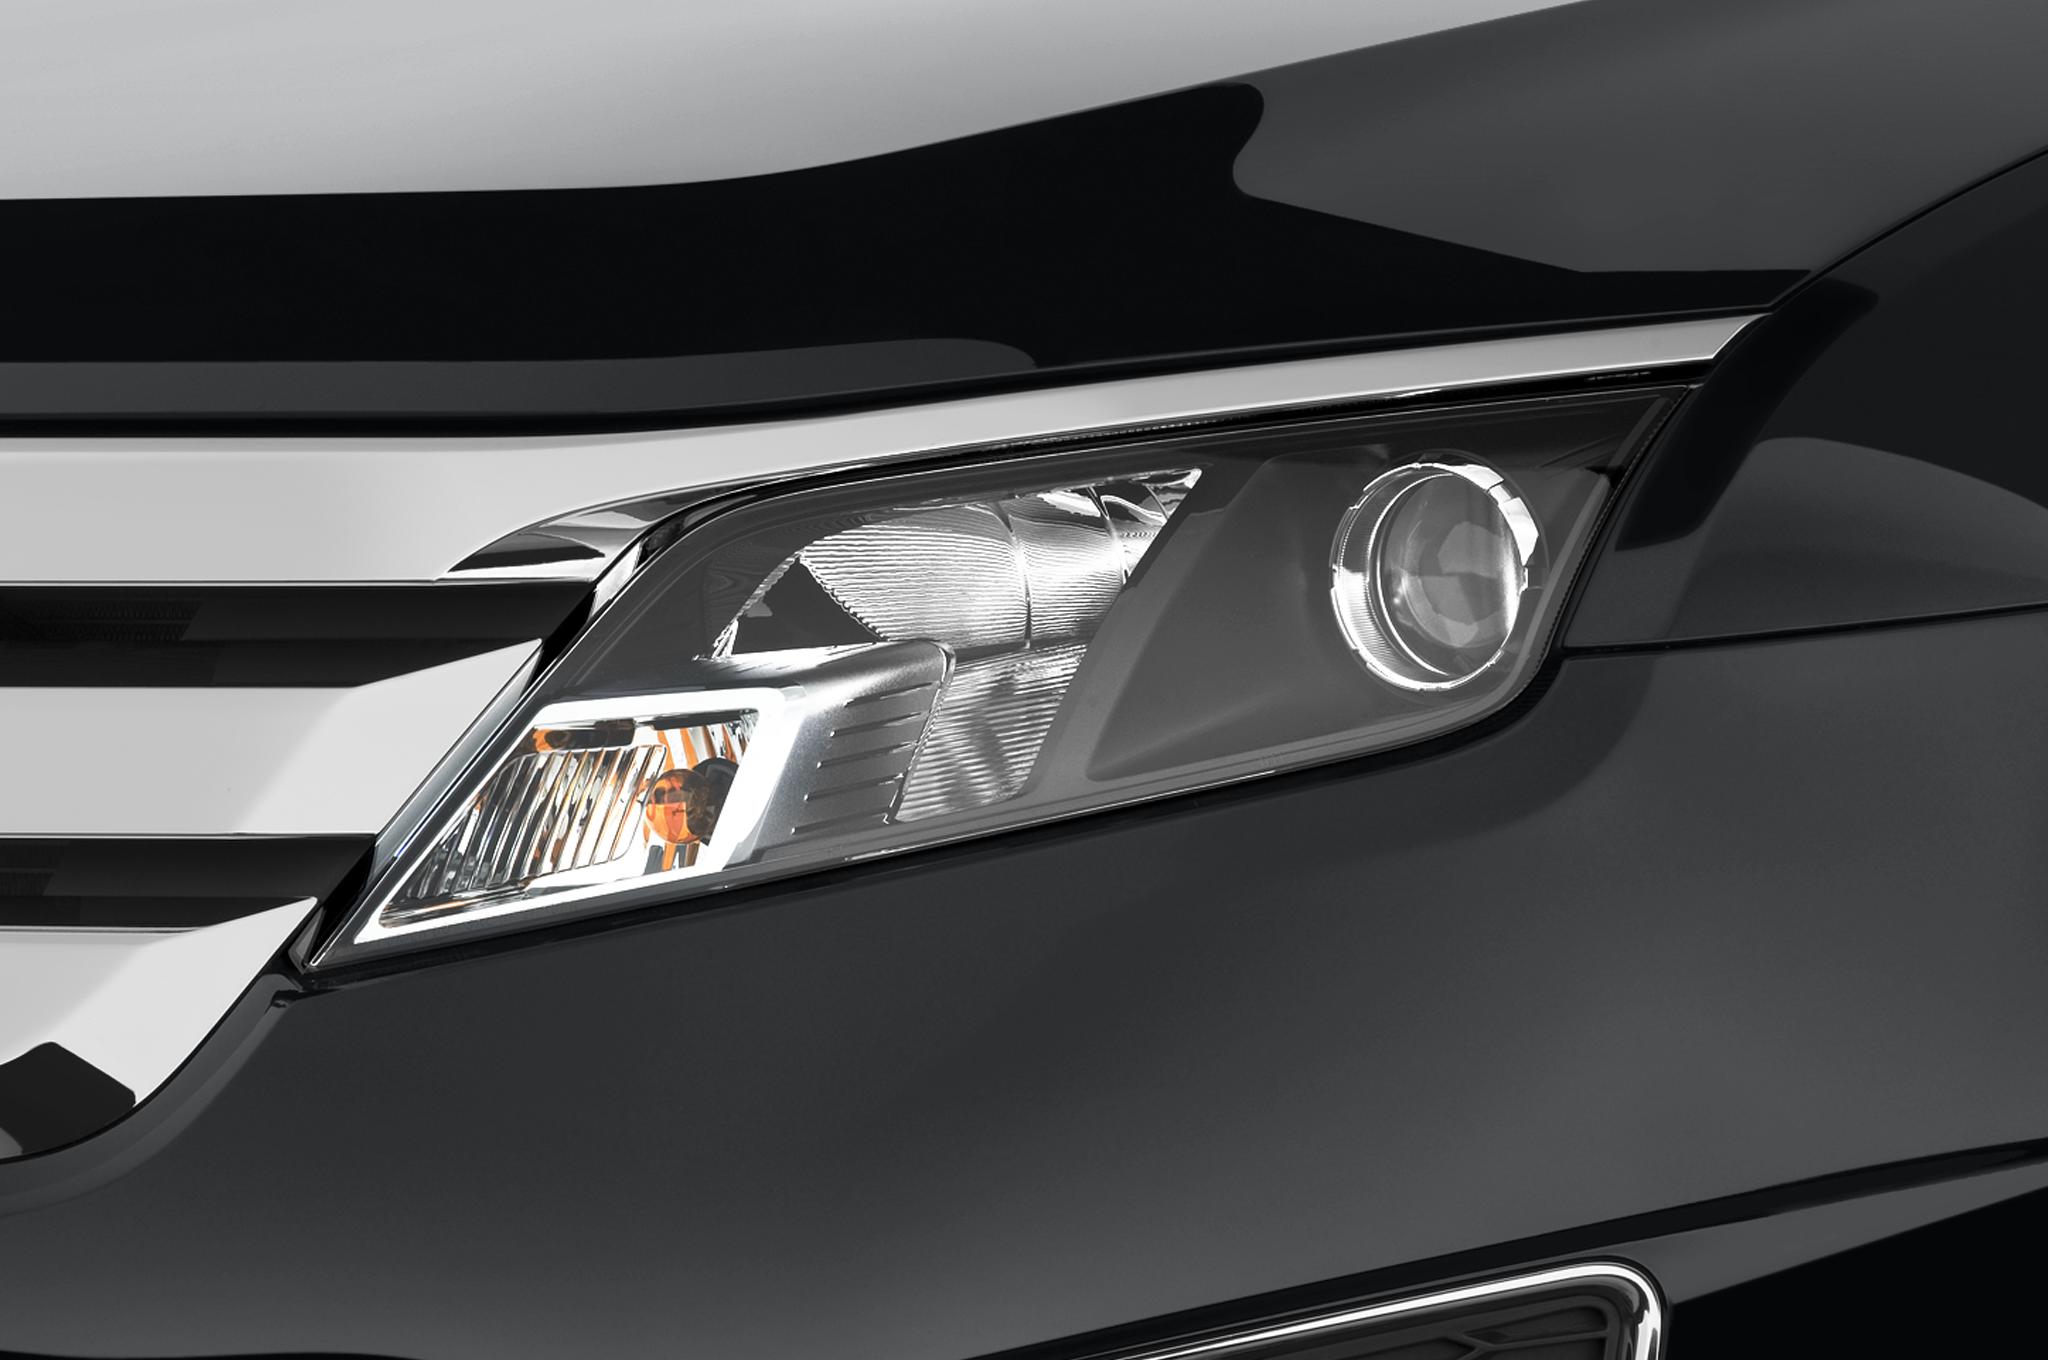 Ford Fusion Hybrid 1,000 Mile Challenge - Fuel Economy